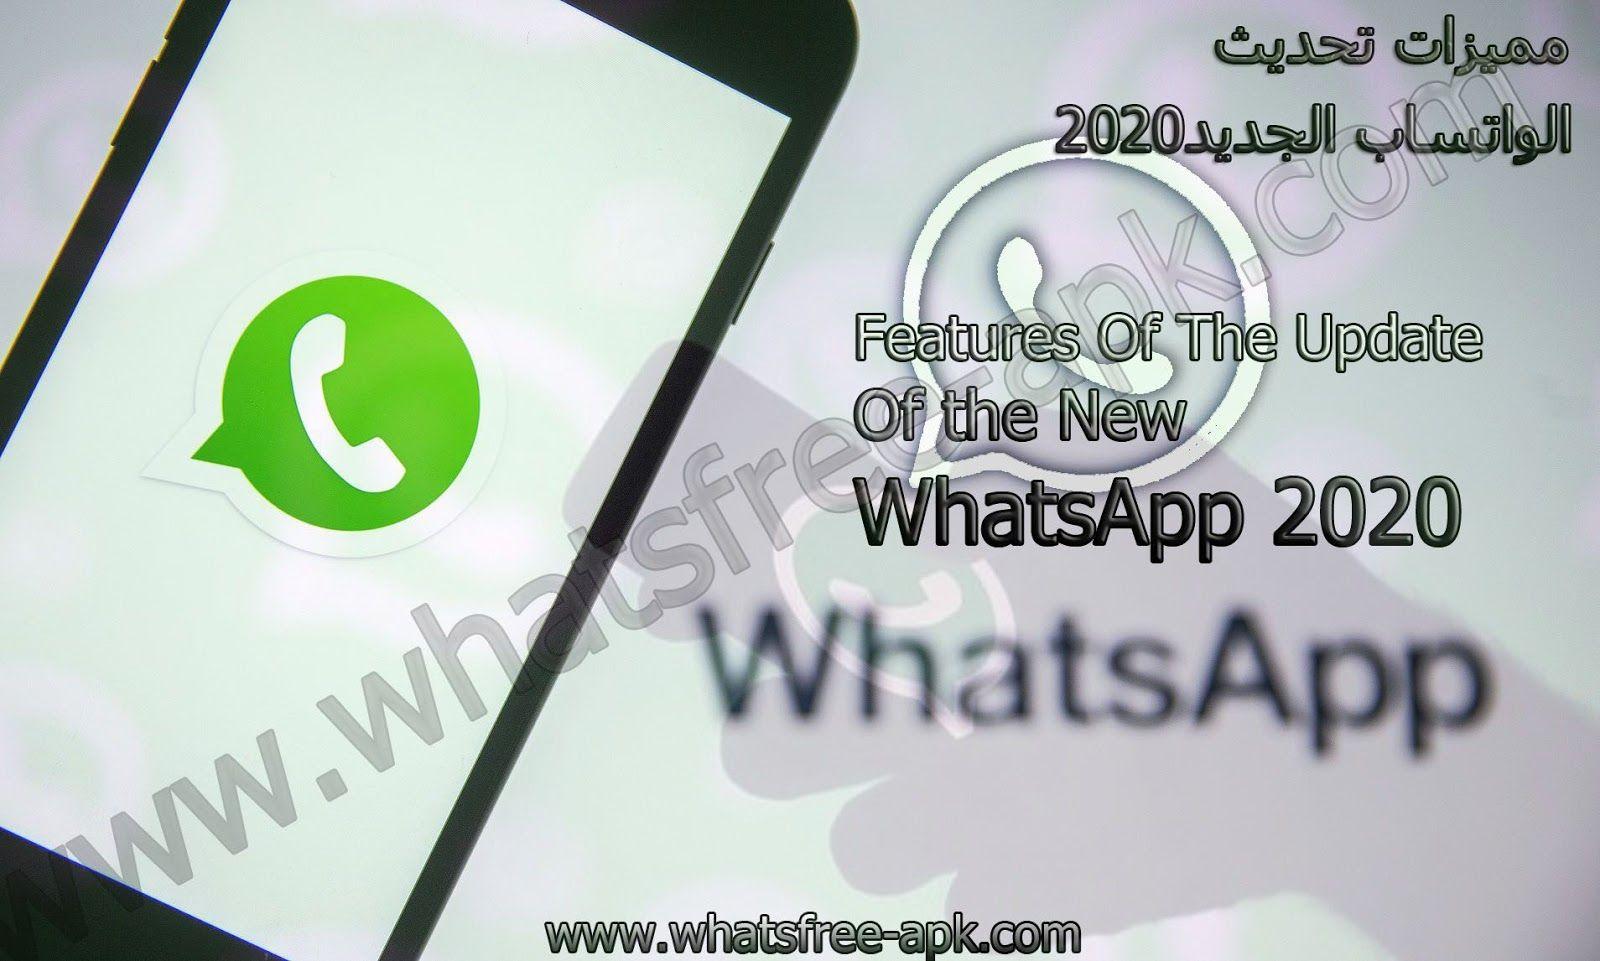 مميزات تحديث الواتساب الجديد 2020 Whatsapp Incoming Call News